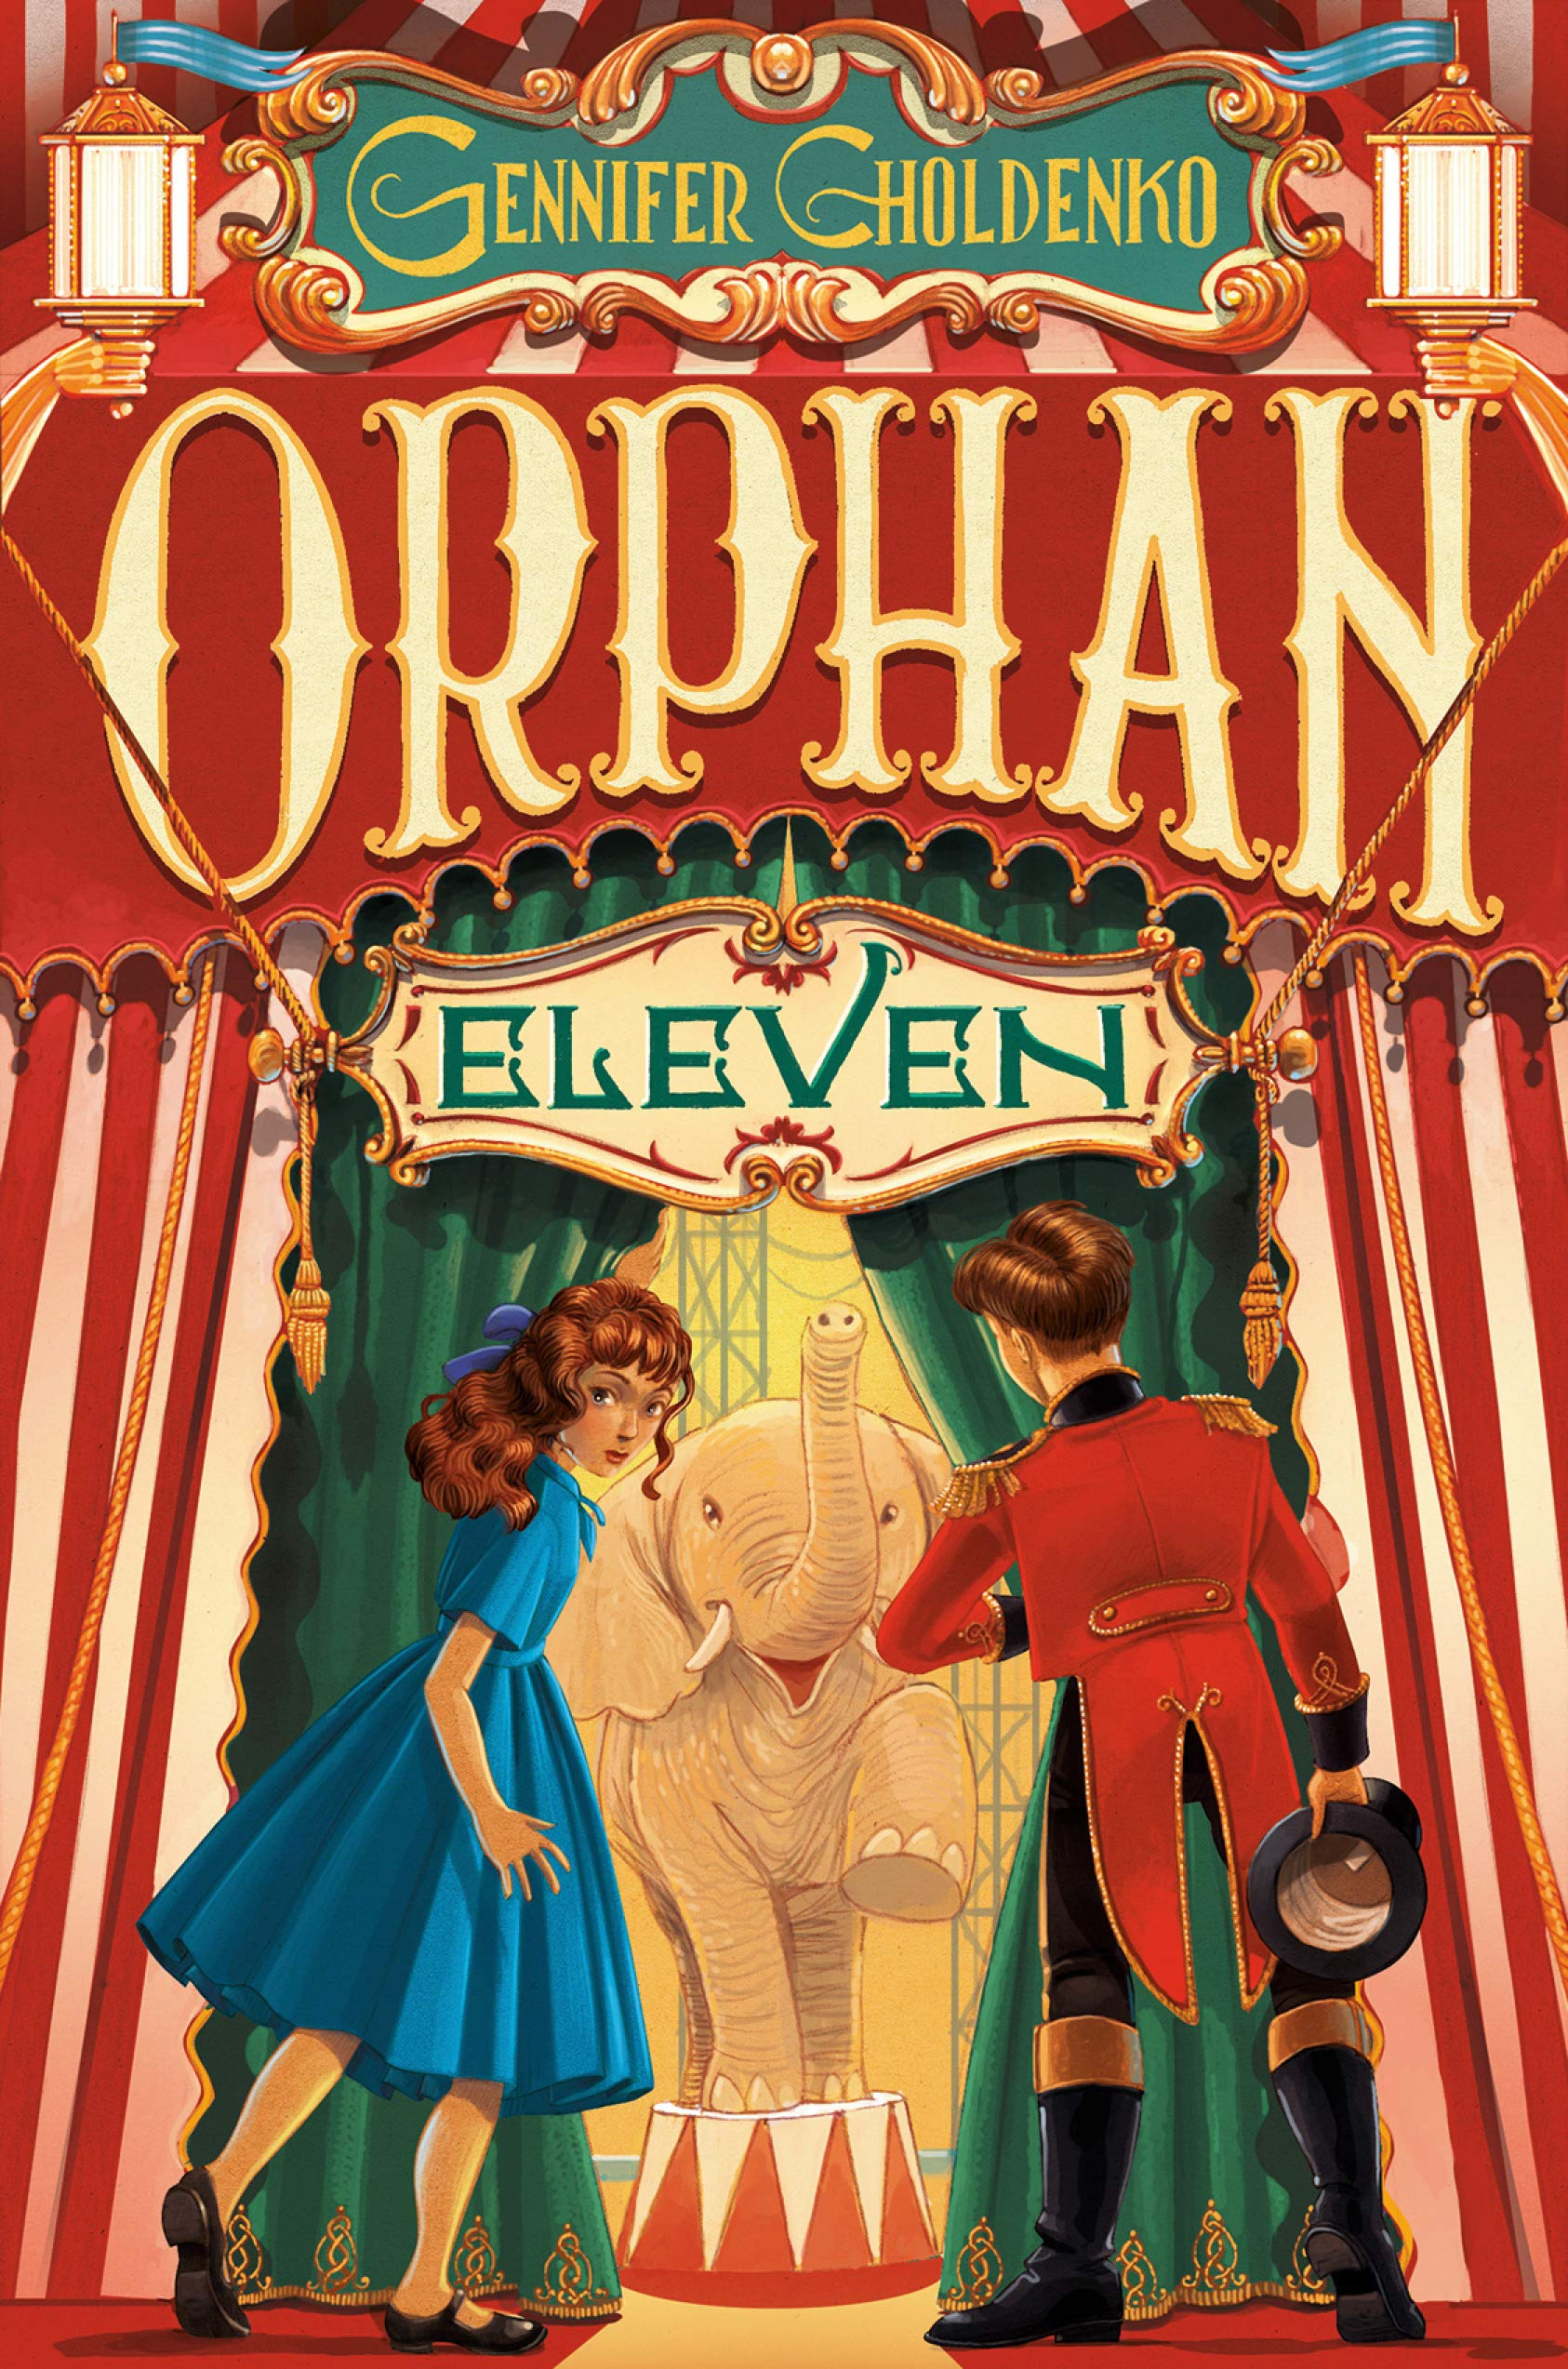 Orphan Eleven: Choldenko, Gennifer: 9780375990649: Amazon.com: Books